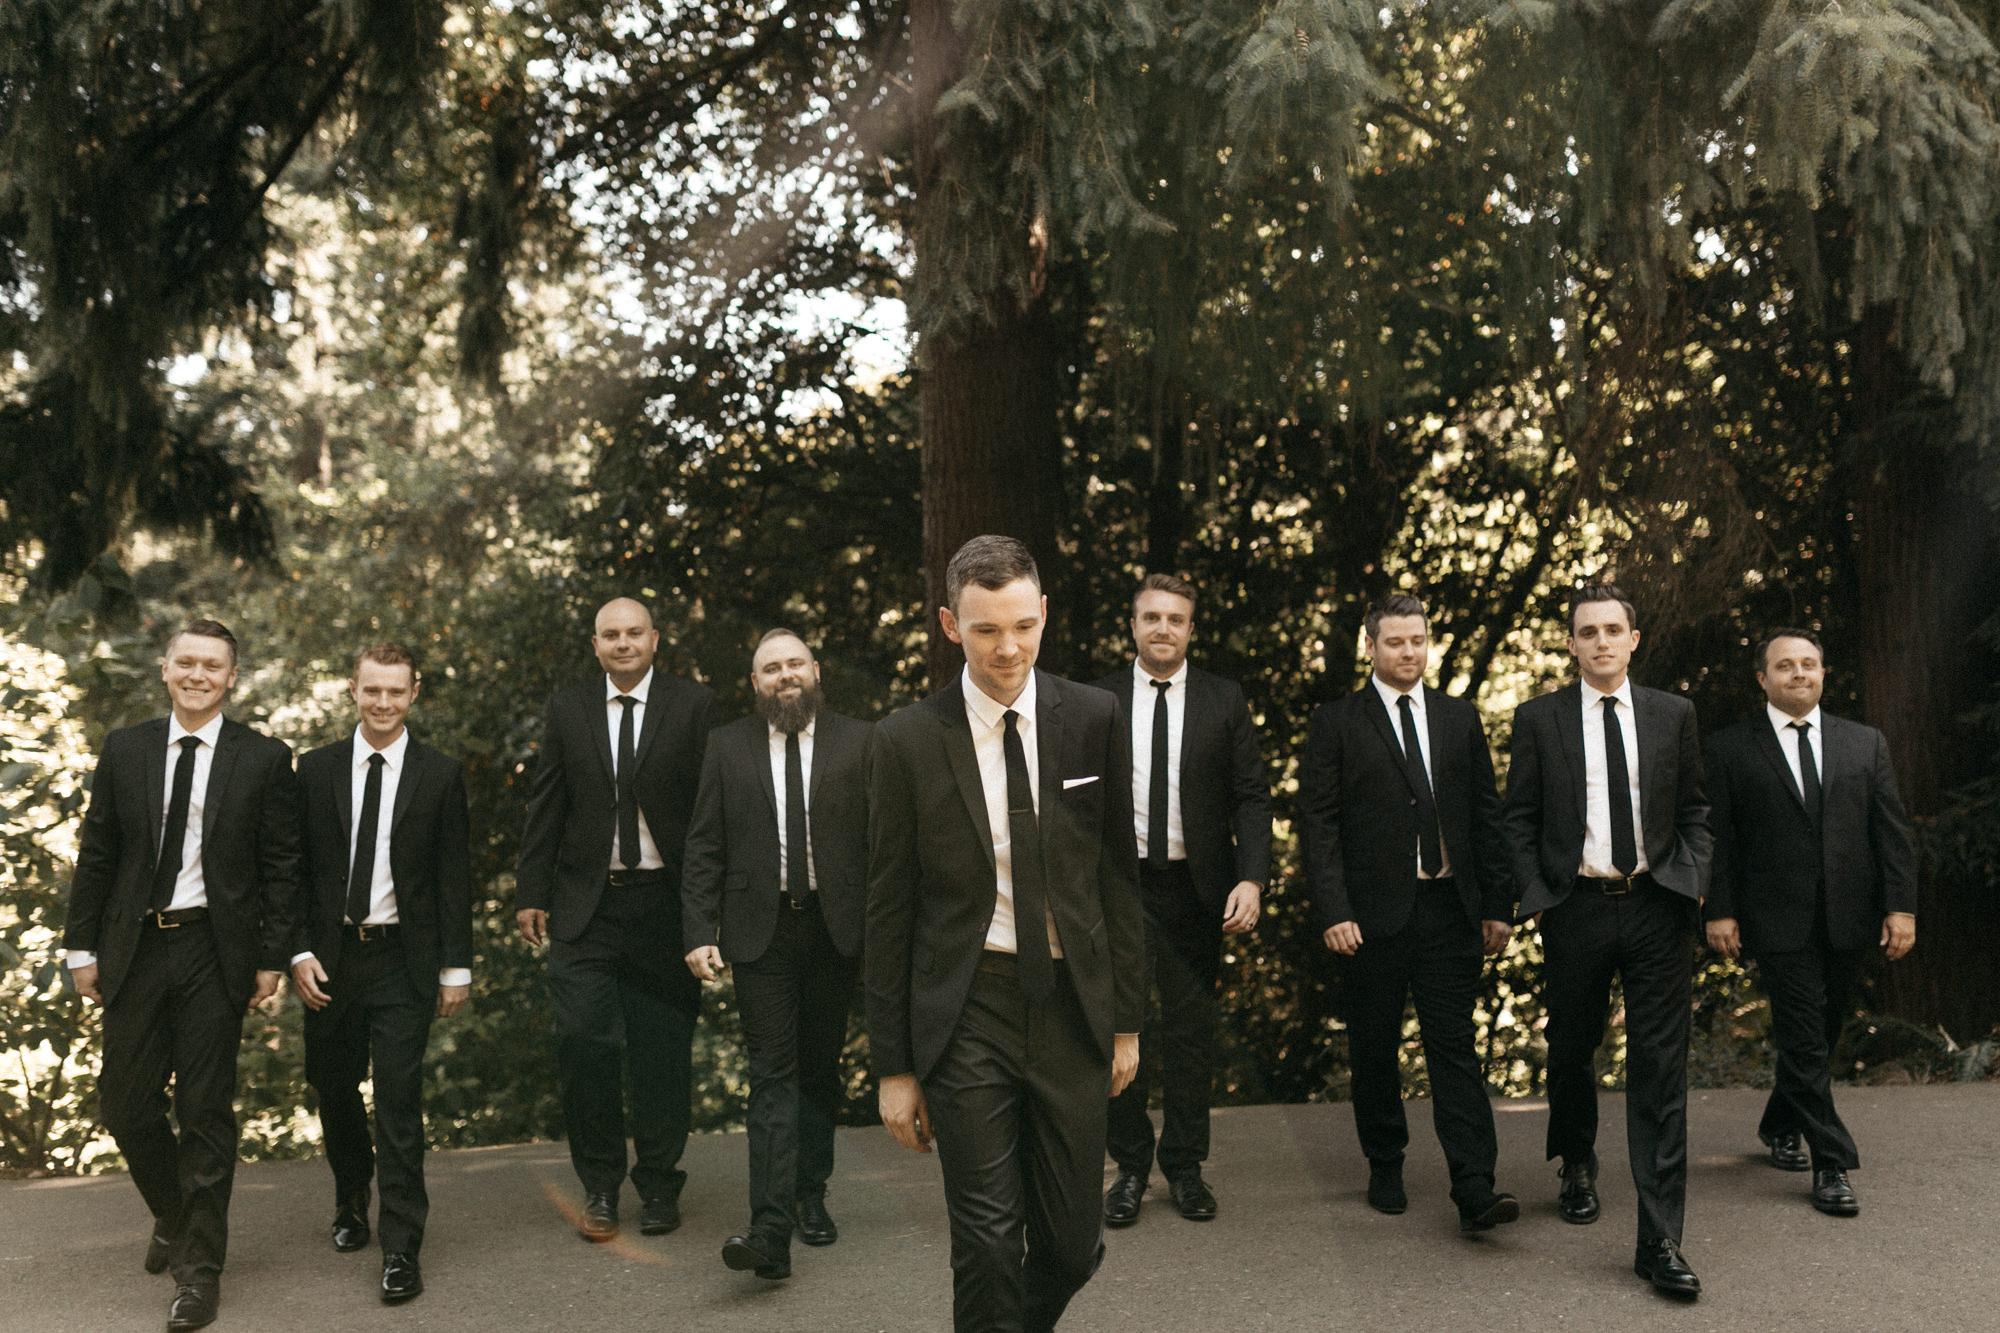 the_evergreen_portland_wedding-32.jpg